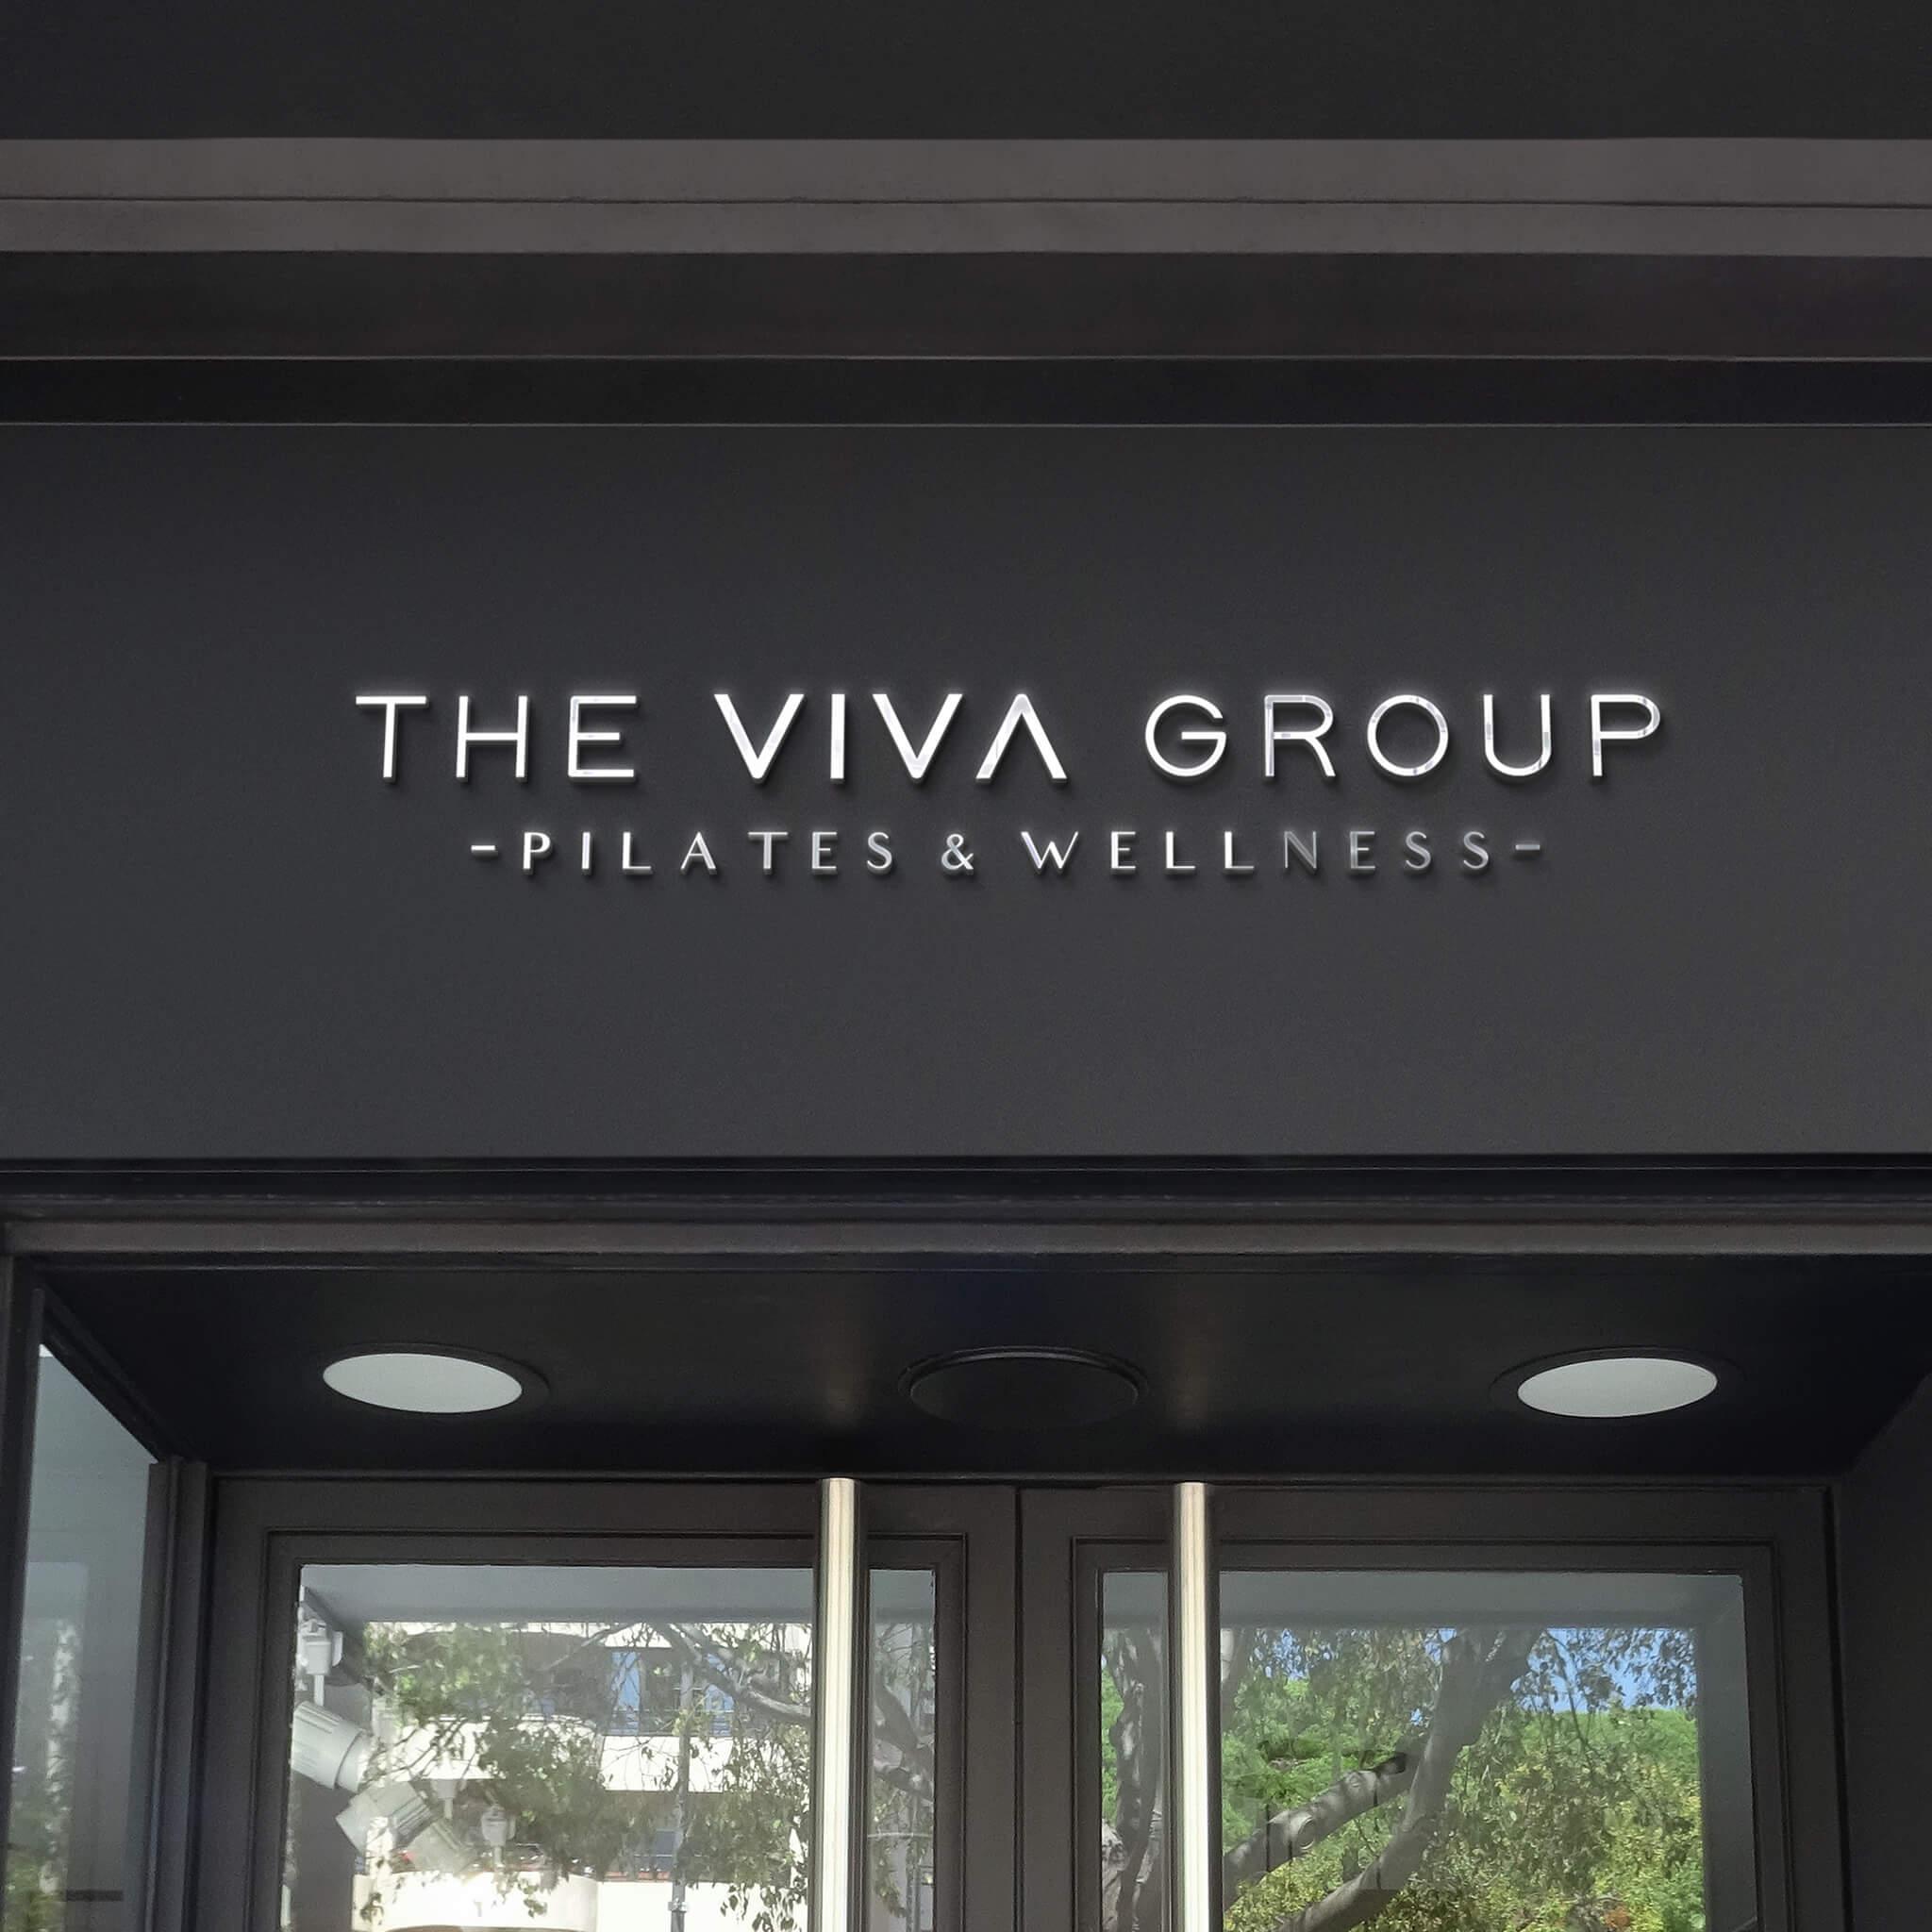 https://zanandcocreative.com.au/wp-content/uploads/2021/04/The-Viva-Group-Logo-Design-Branding-Design-2.jpg